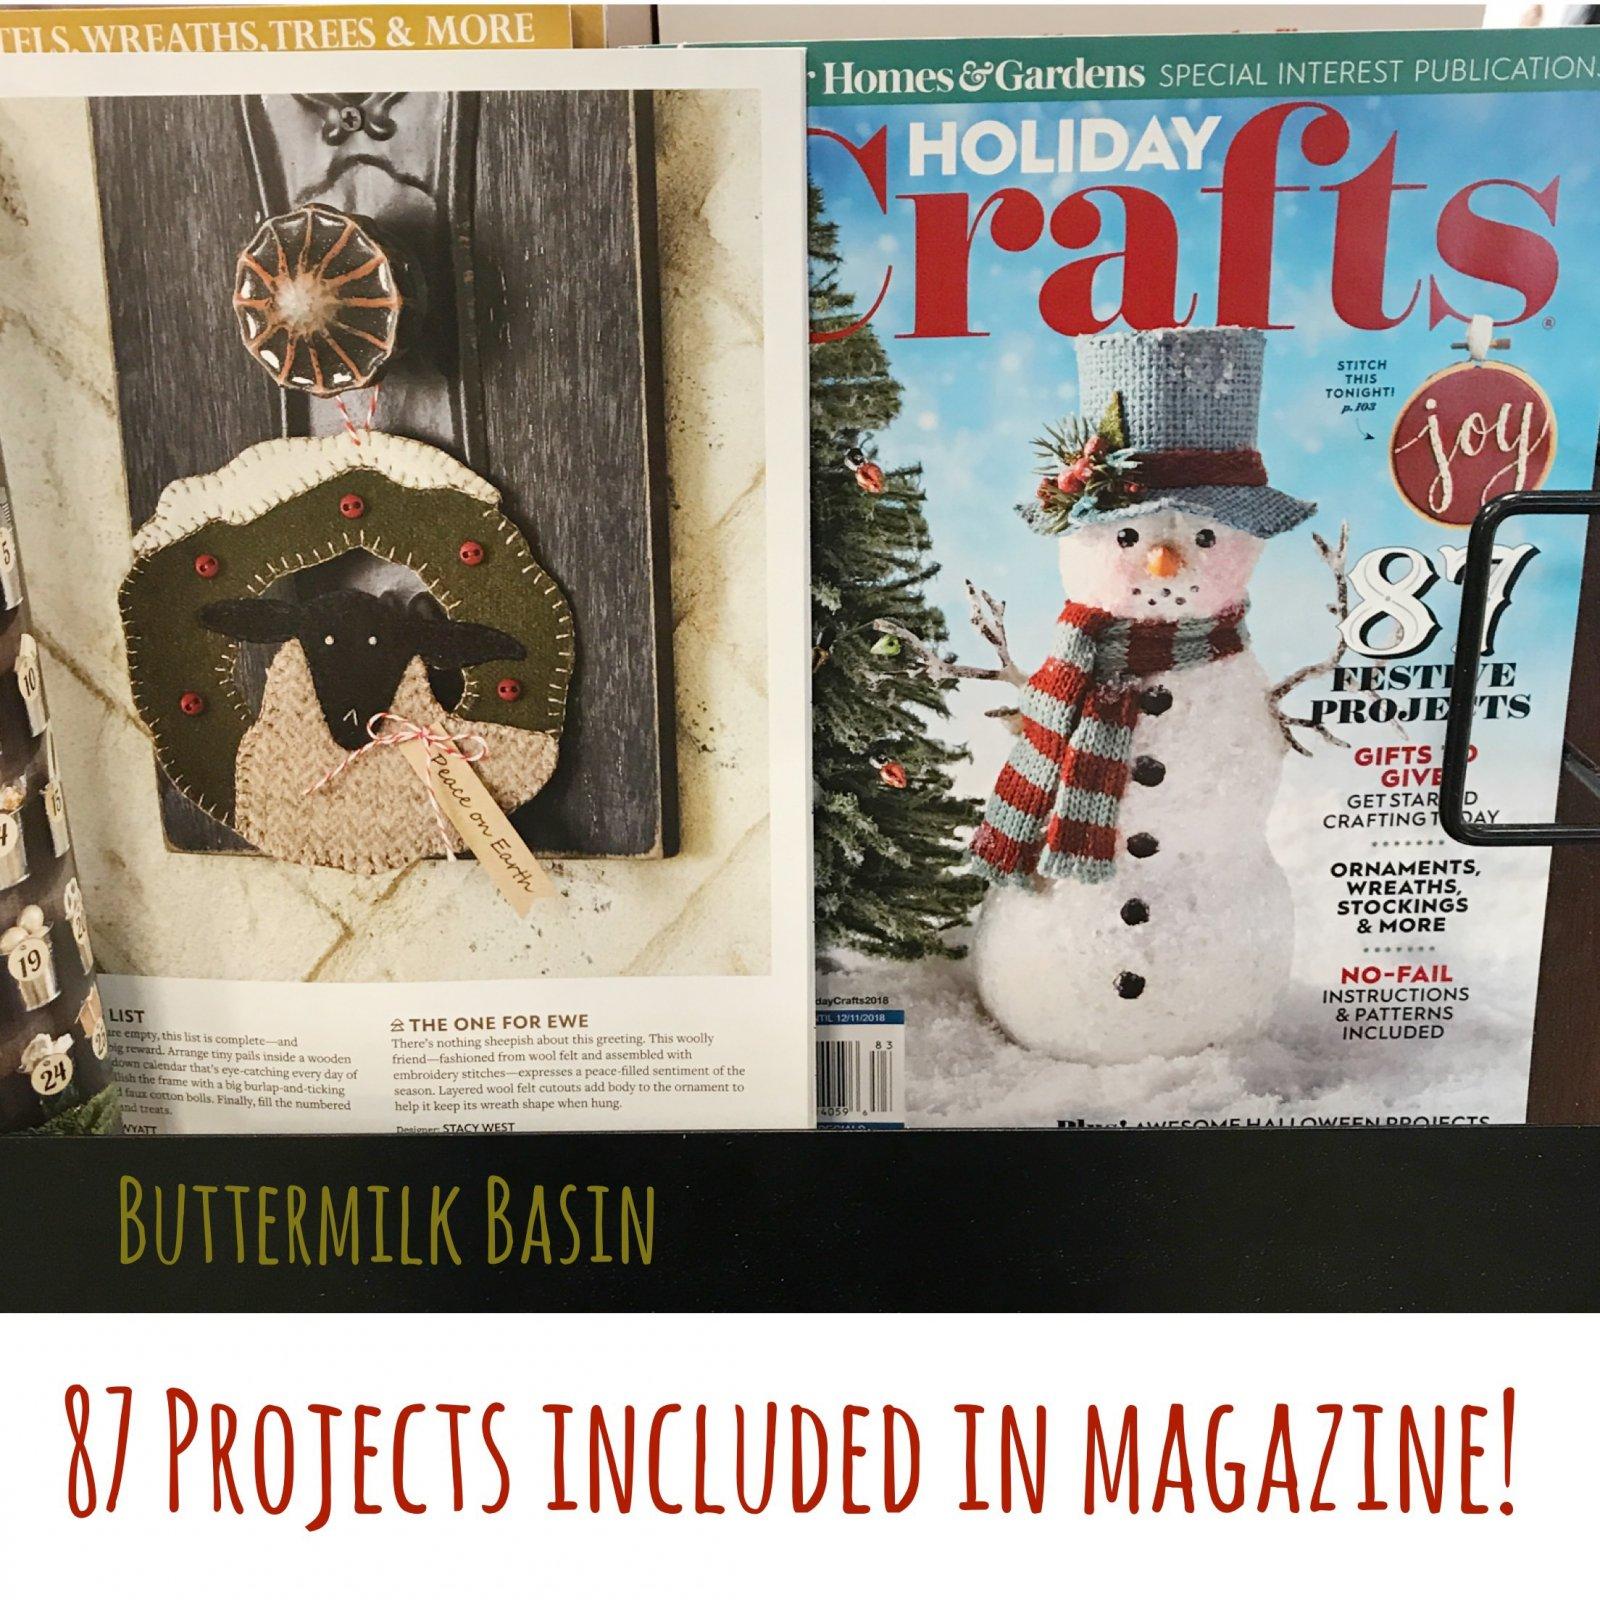 Holiday Crafts Magazine - 2018